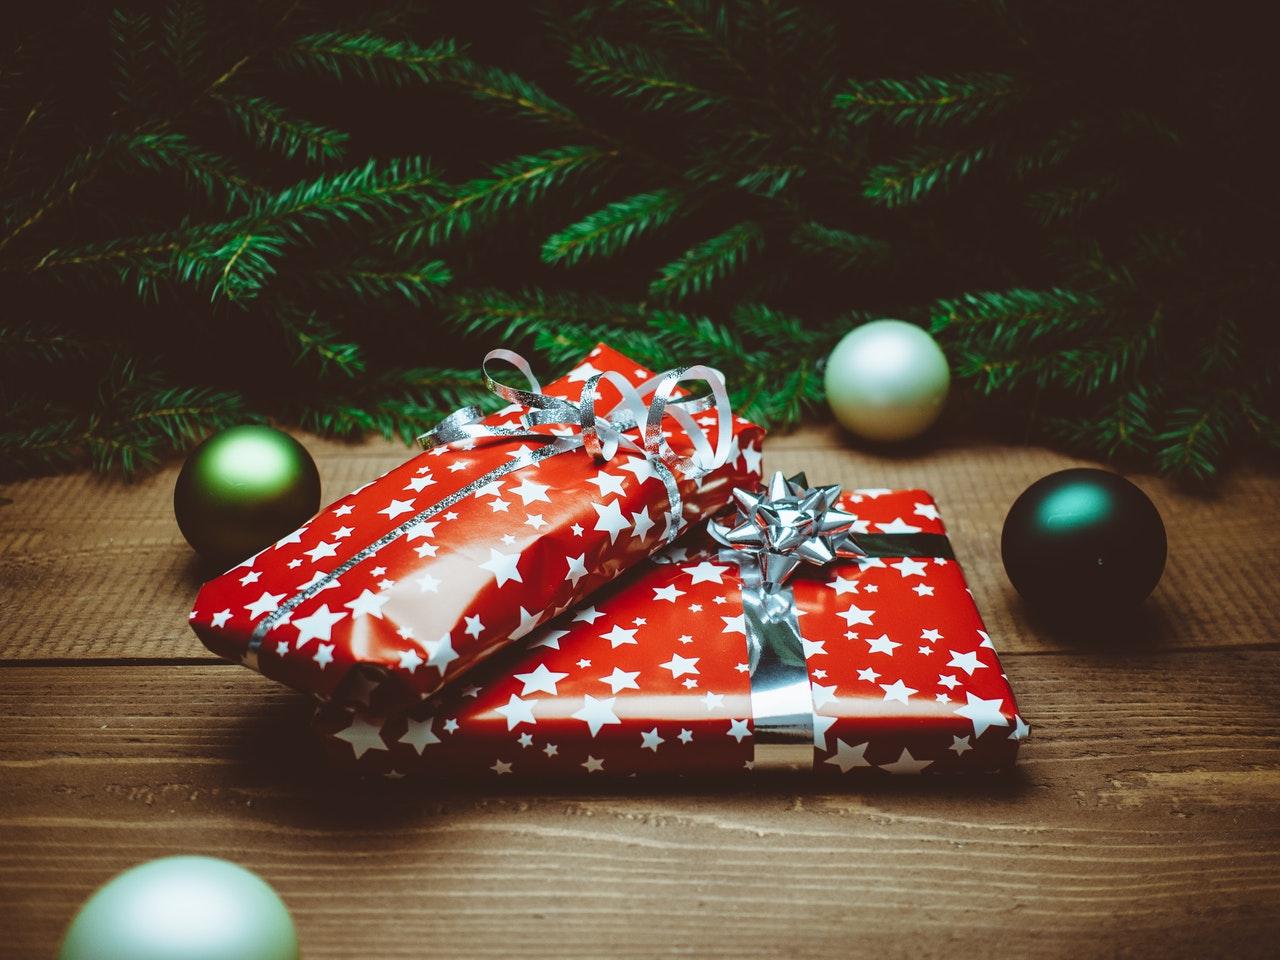 gift-present-wrapped-ribbon-85875.jpeg